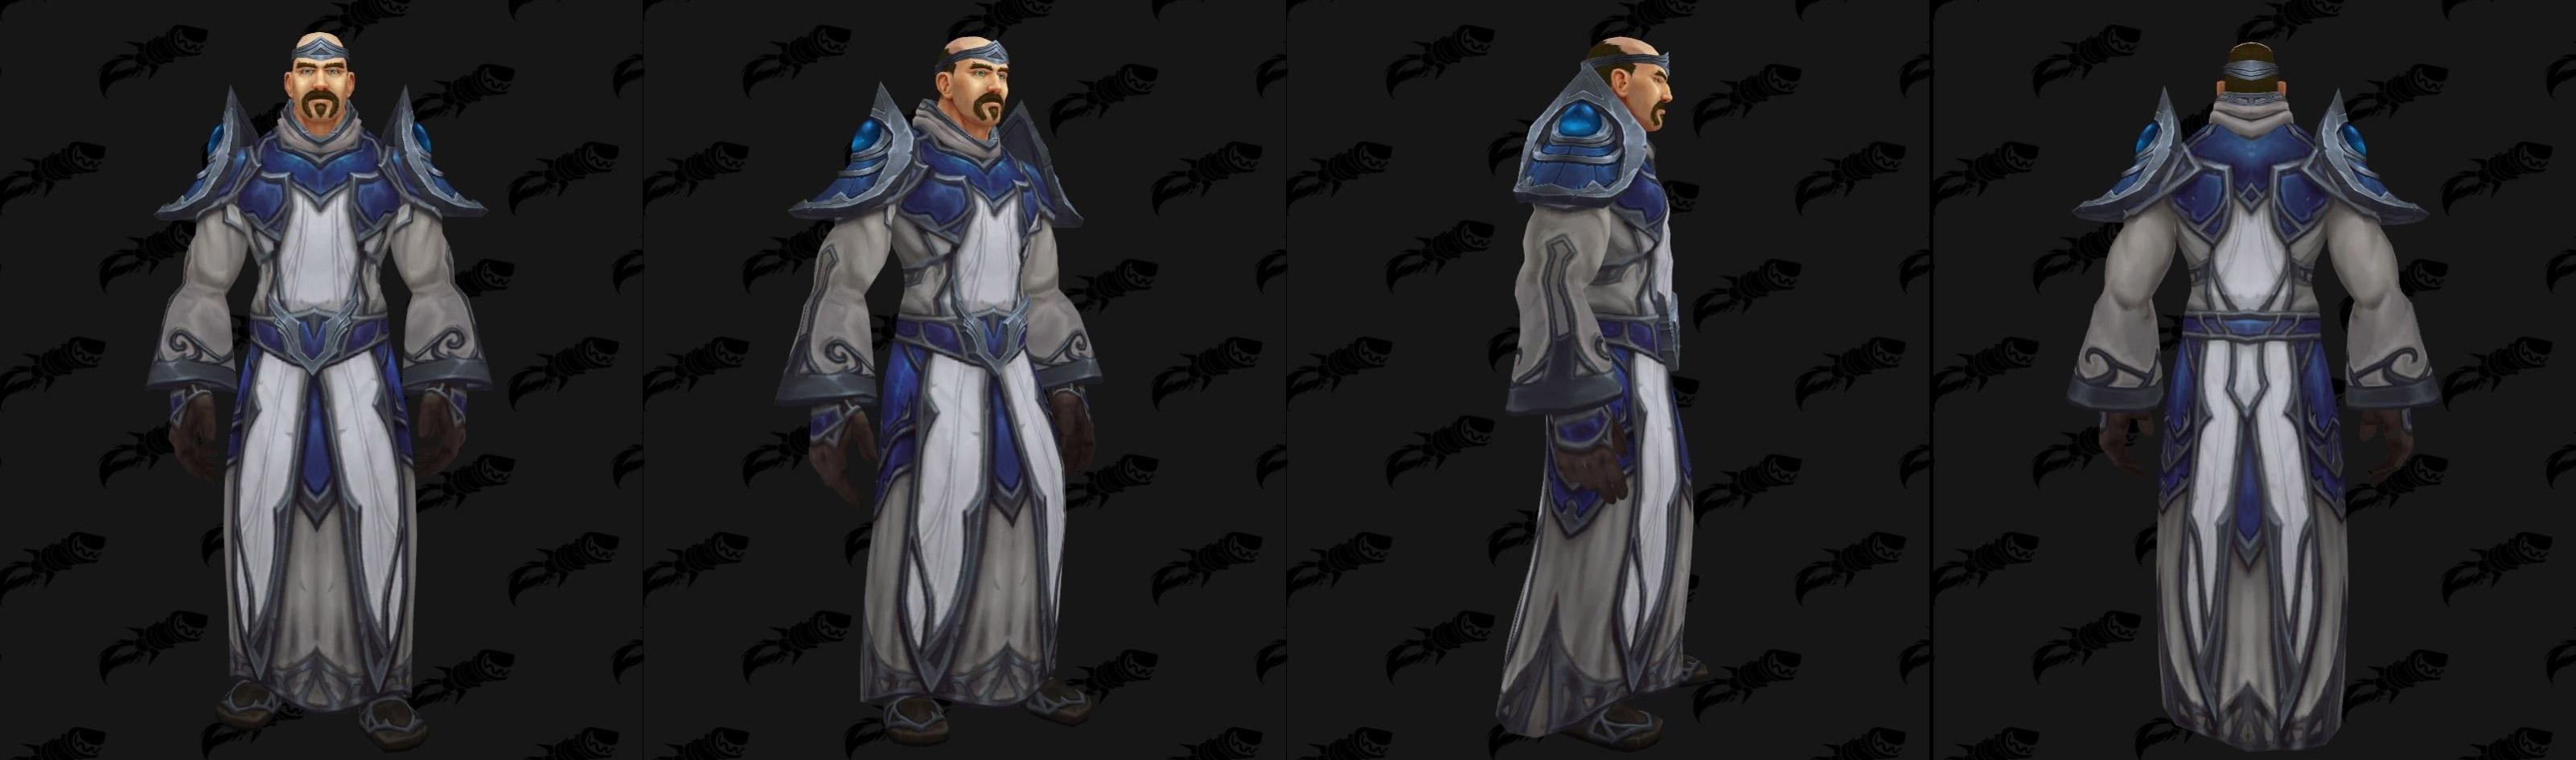 Armures tissu (Alliance) - Fronts de guerre Tier 1 - Coloris 2